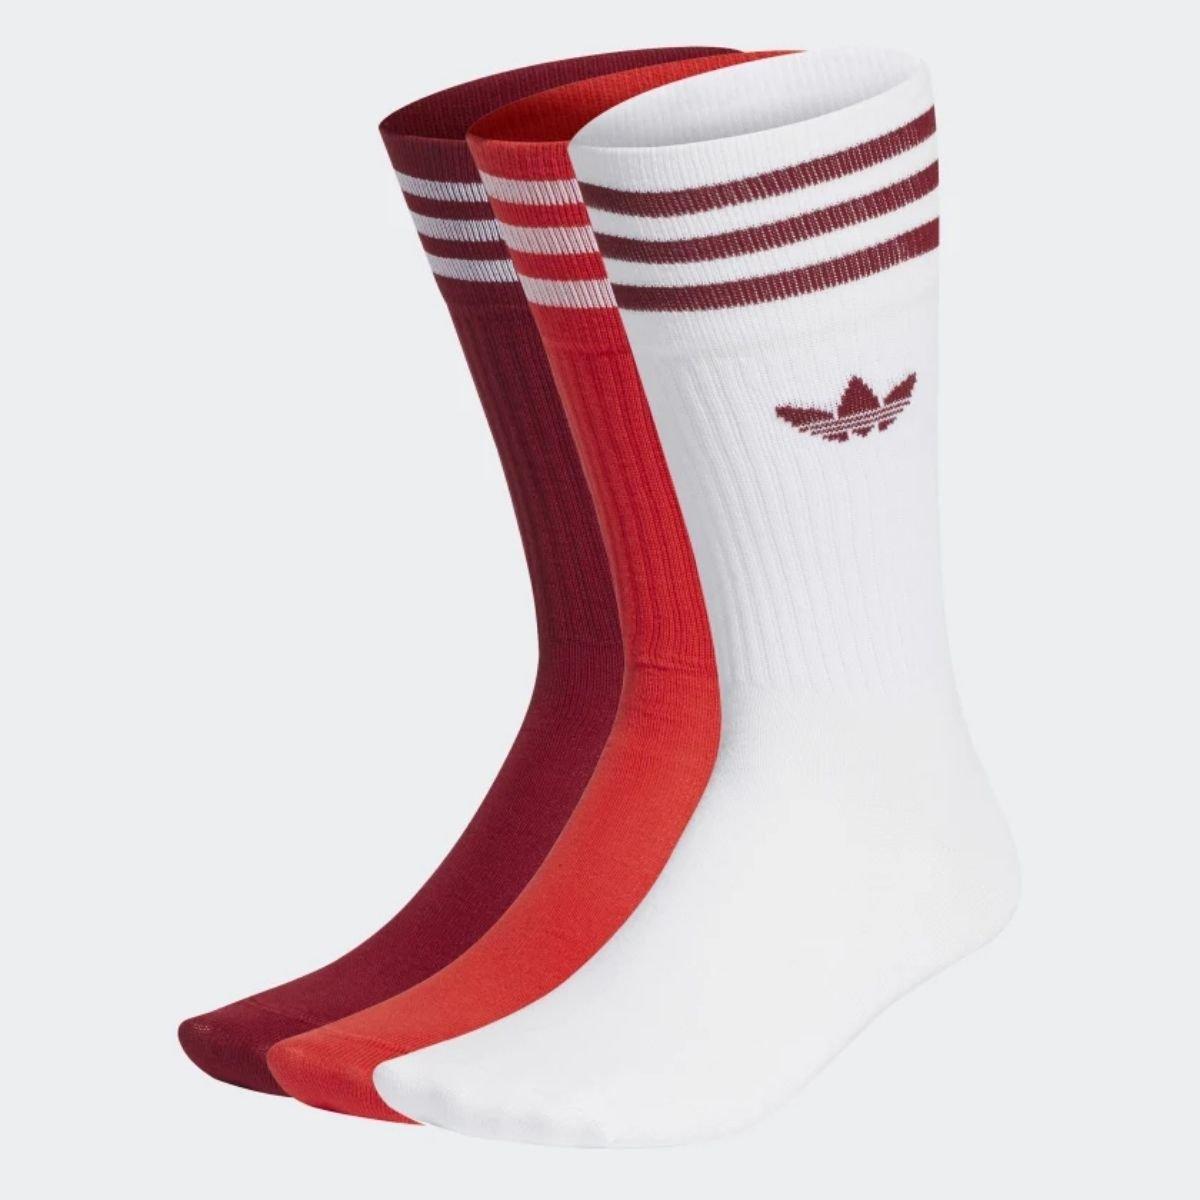 Calza Adidas Lunghezza Al...